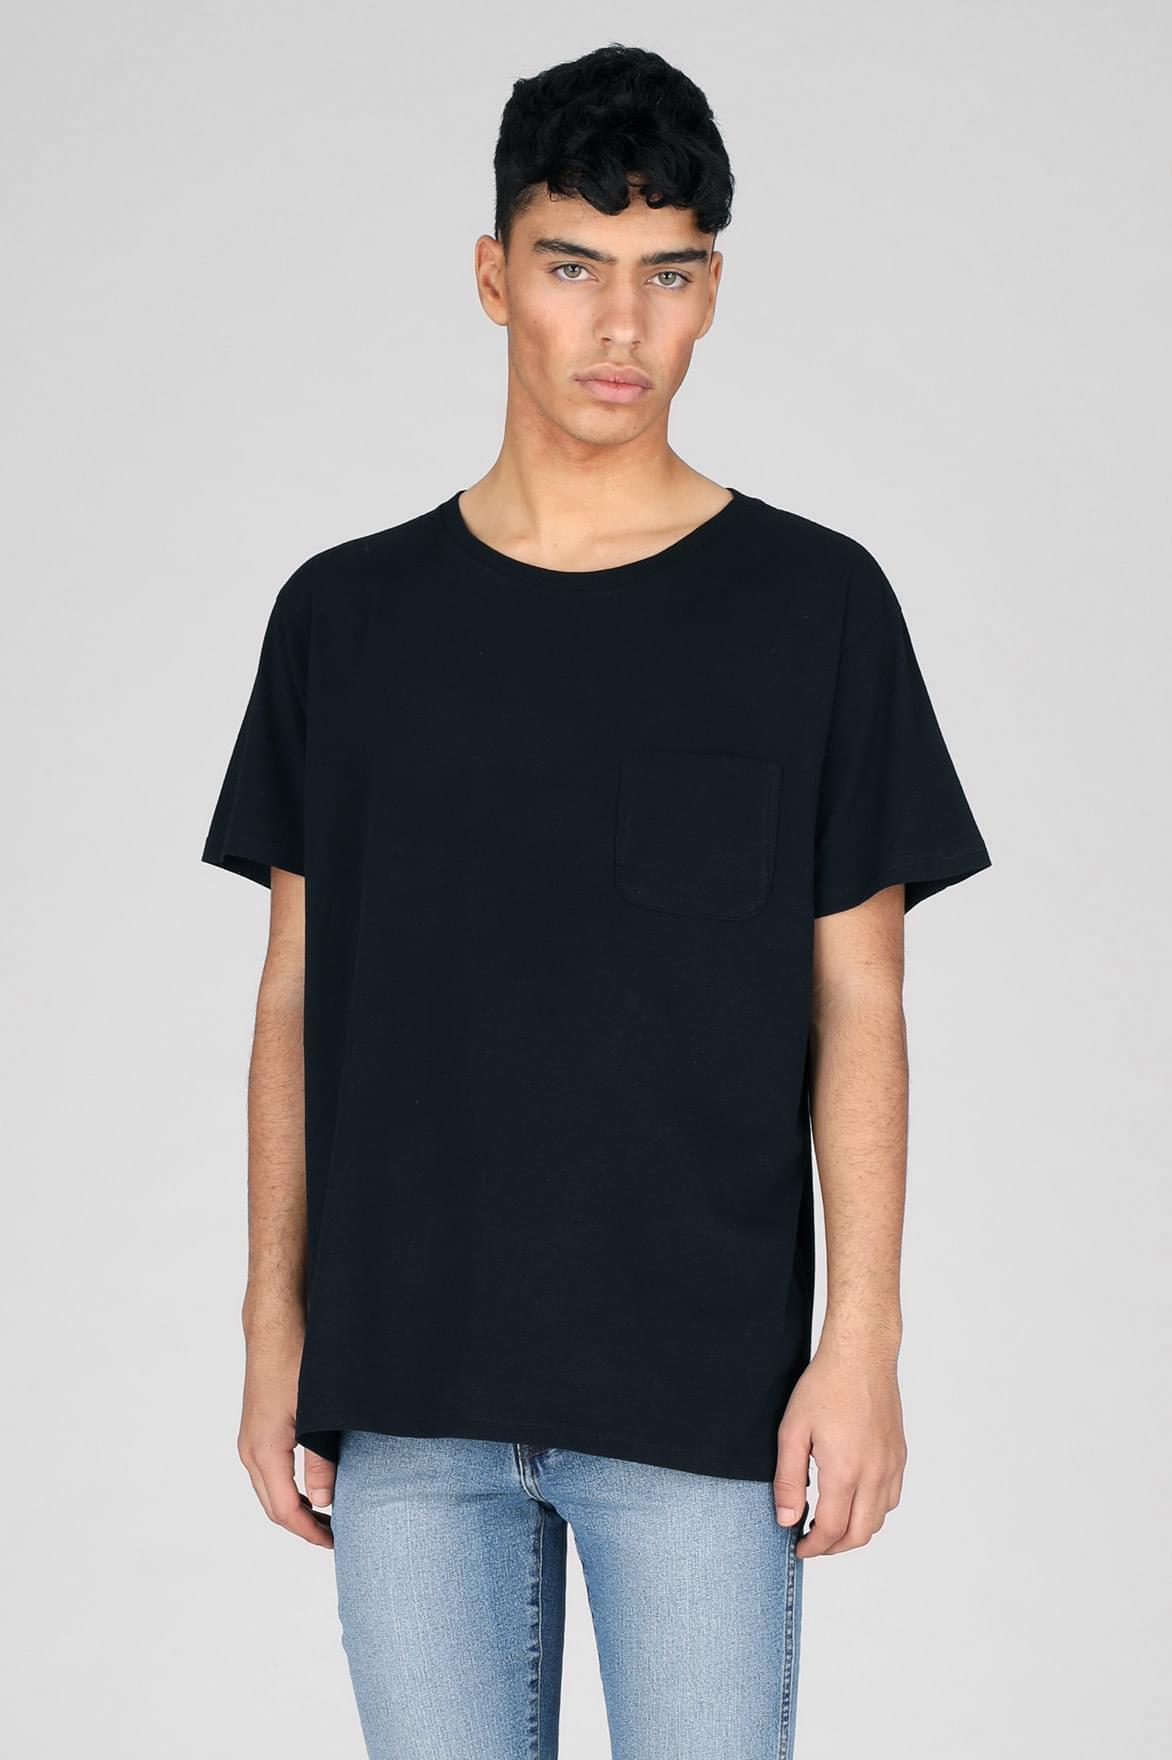 36153ff42ff T-shirts Herr   Shoppa Outlet Deals   Afound